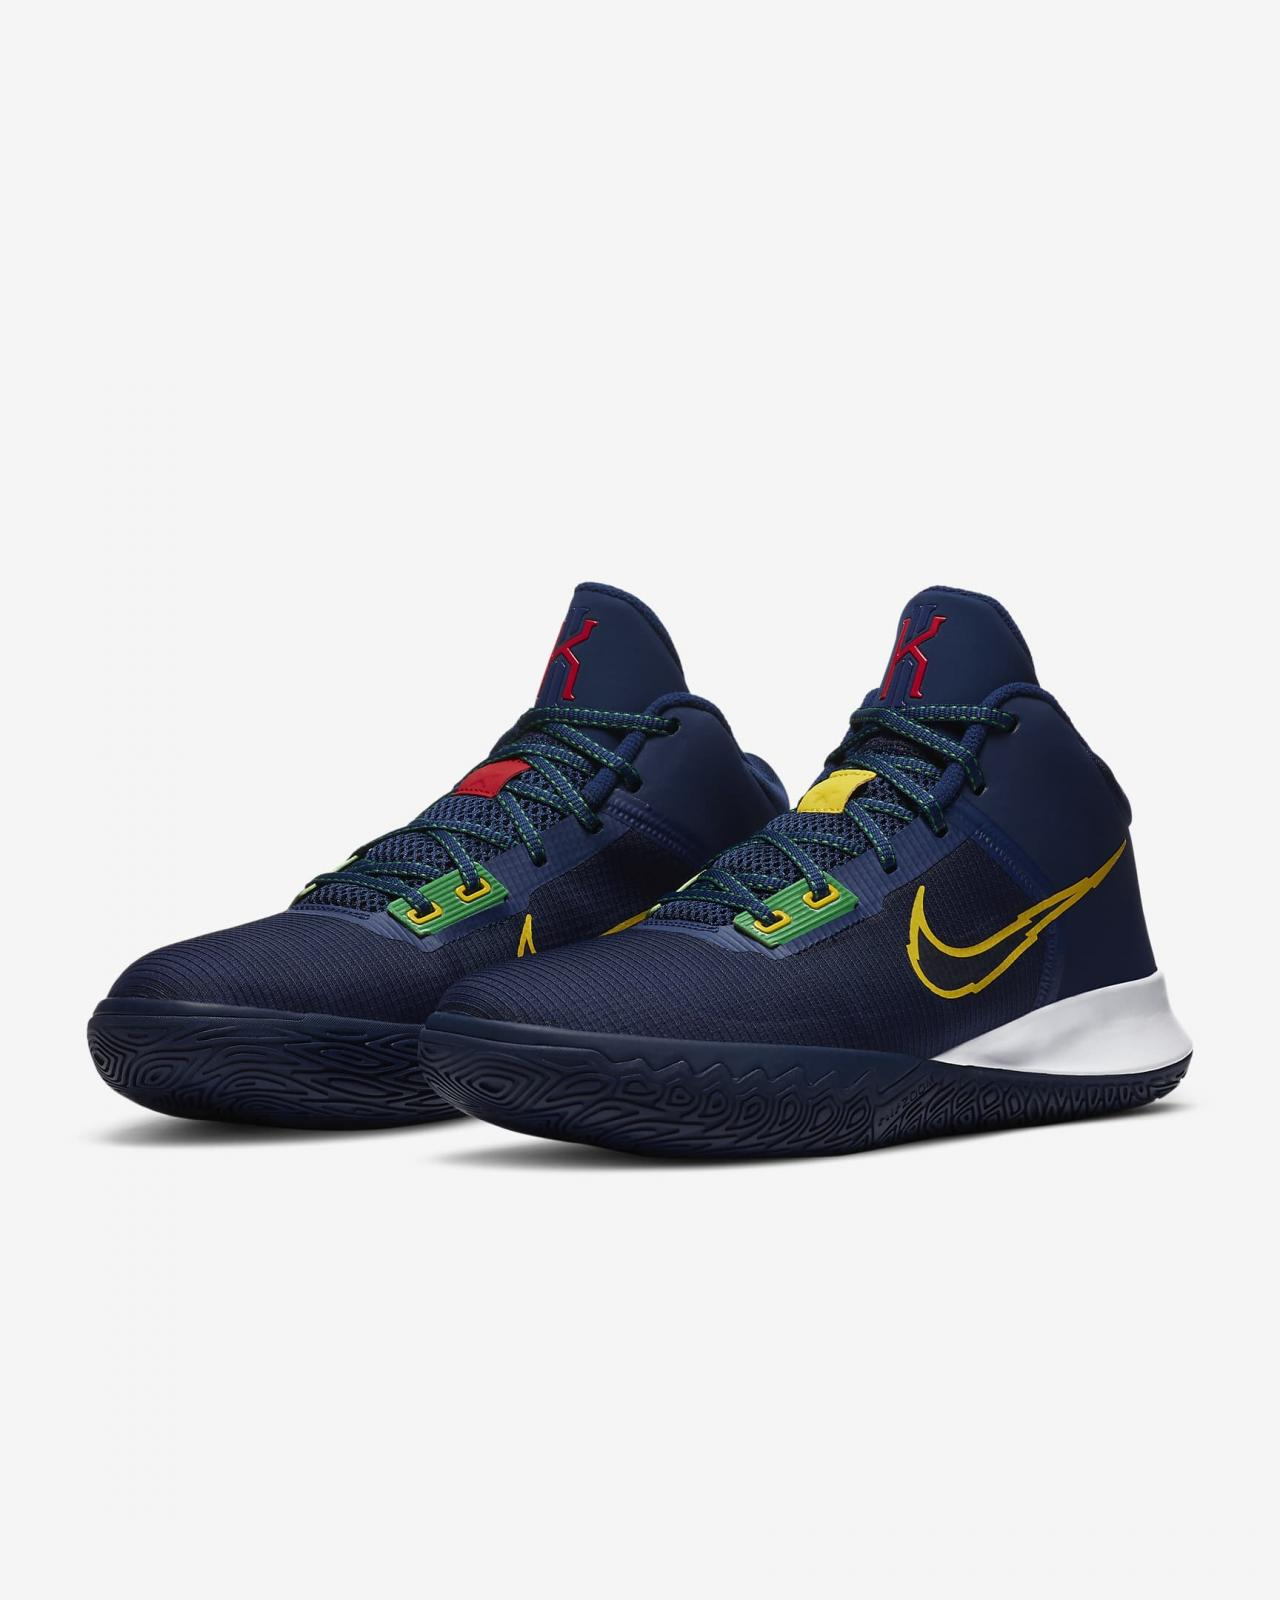 Nike Basketball推出全新空间蓝/深宝蓝/幸运绿/速度黄色Kyrie Flytrap IV EP